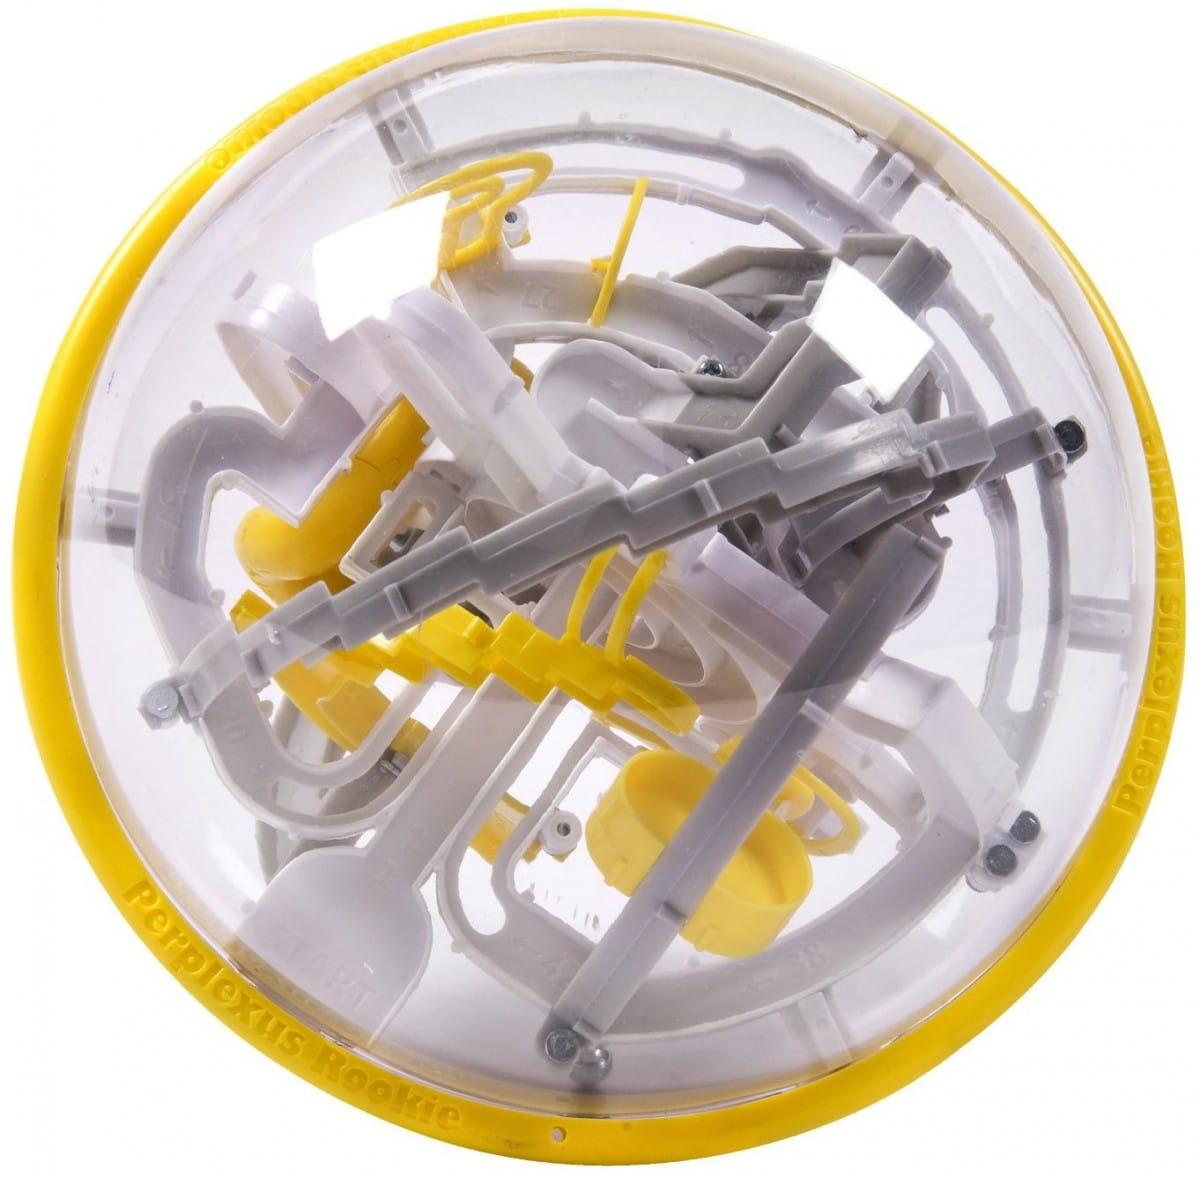 Головоломка Spin Master Perplexus Rookie - 70 барьеров